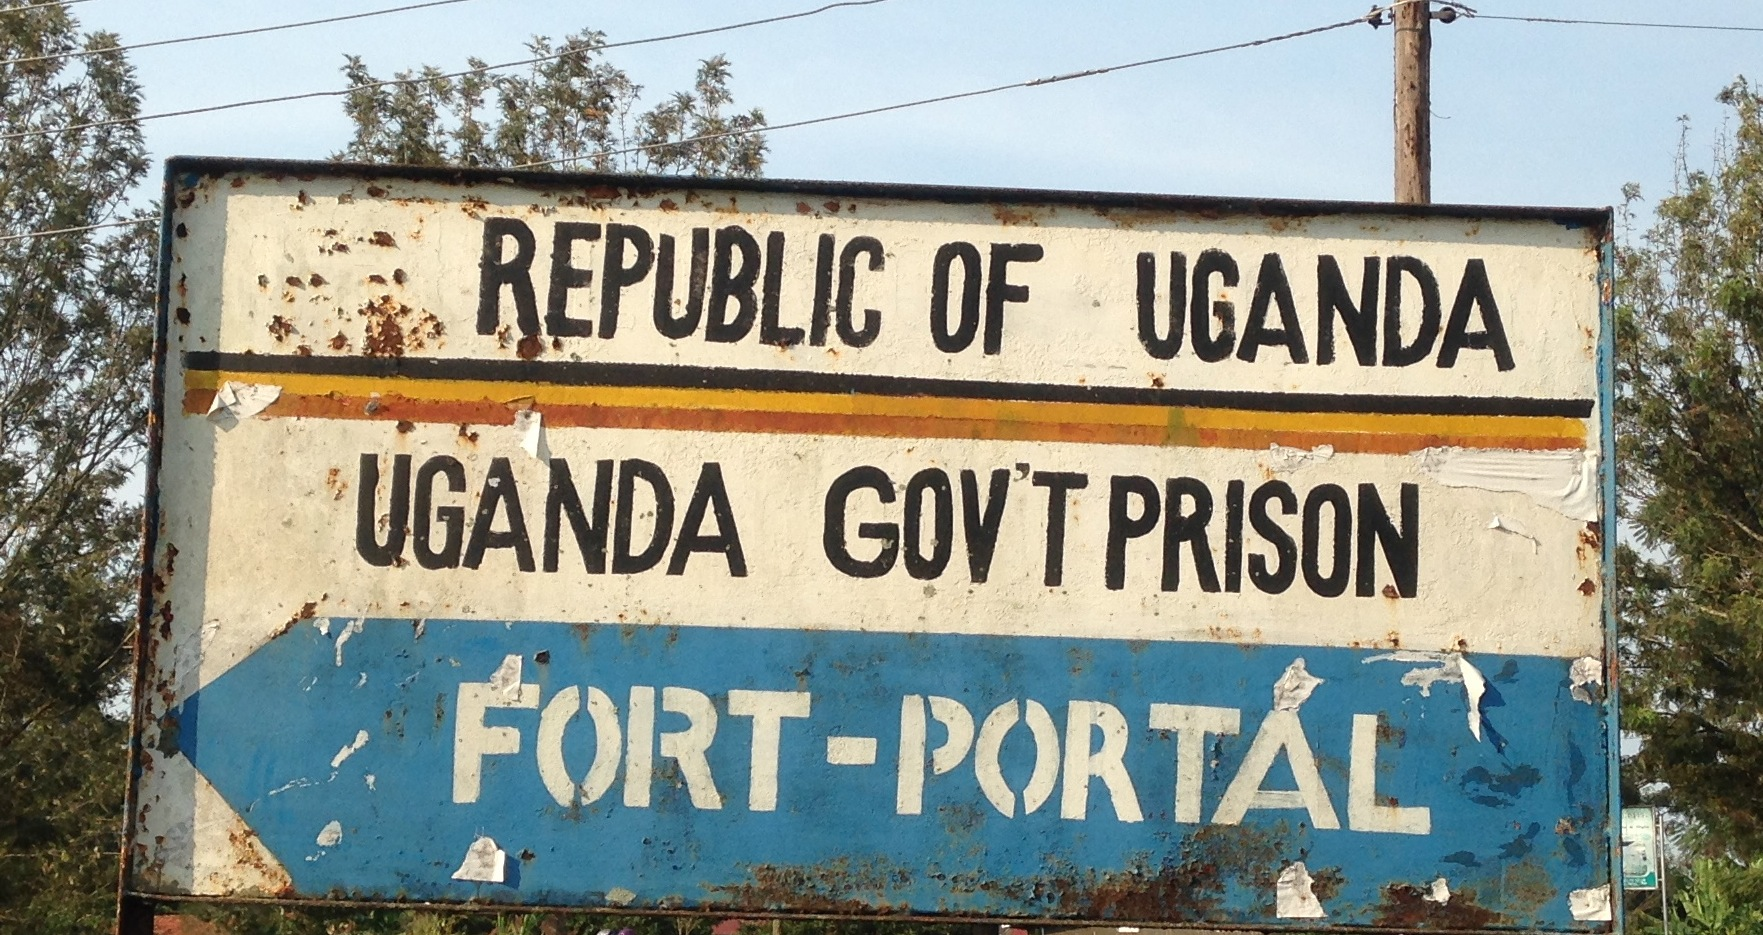 Testing prison officers' professionalism